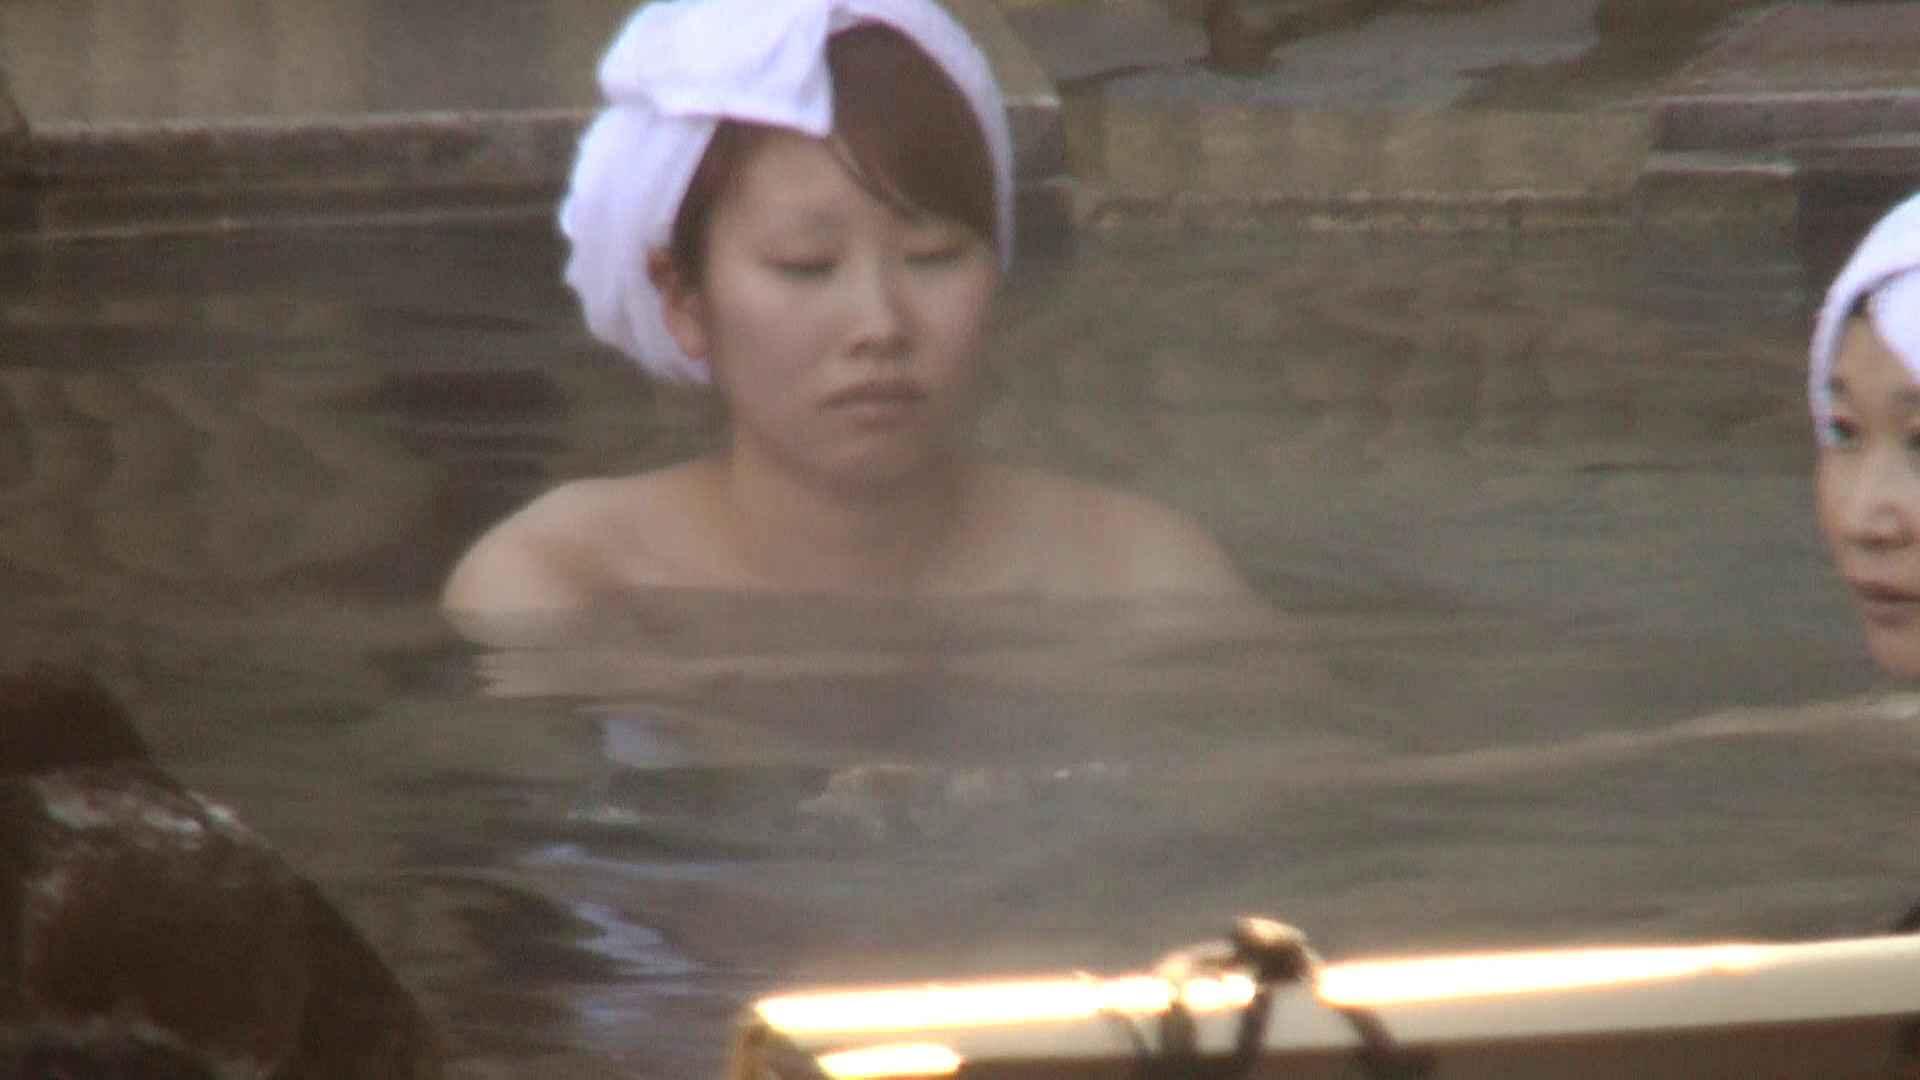 Aquaな露天風呂Vol.210 露天風呂編  86PIX 44